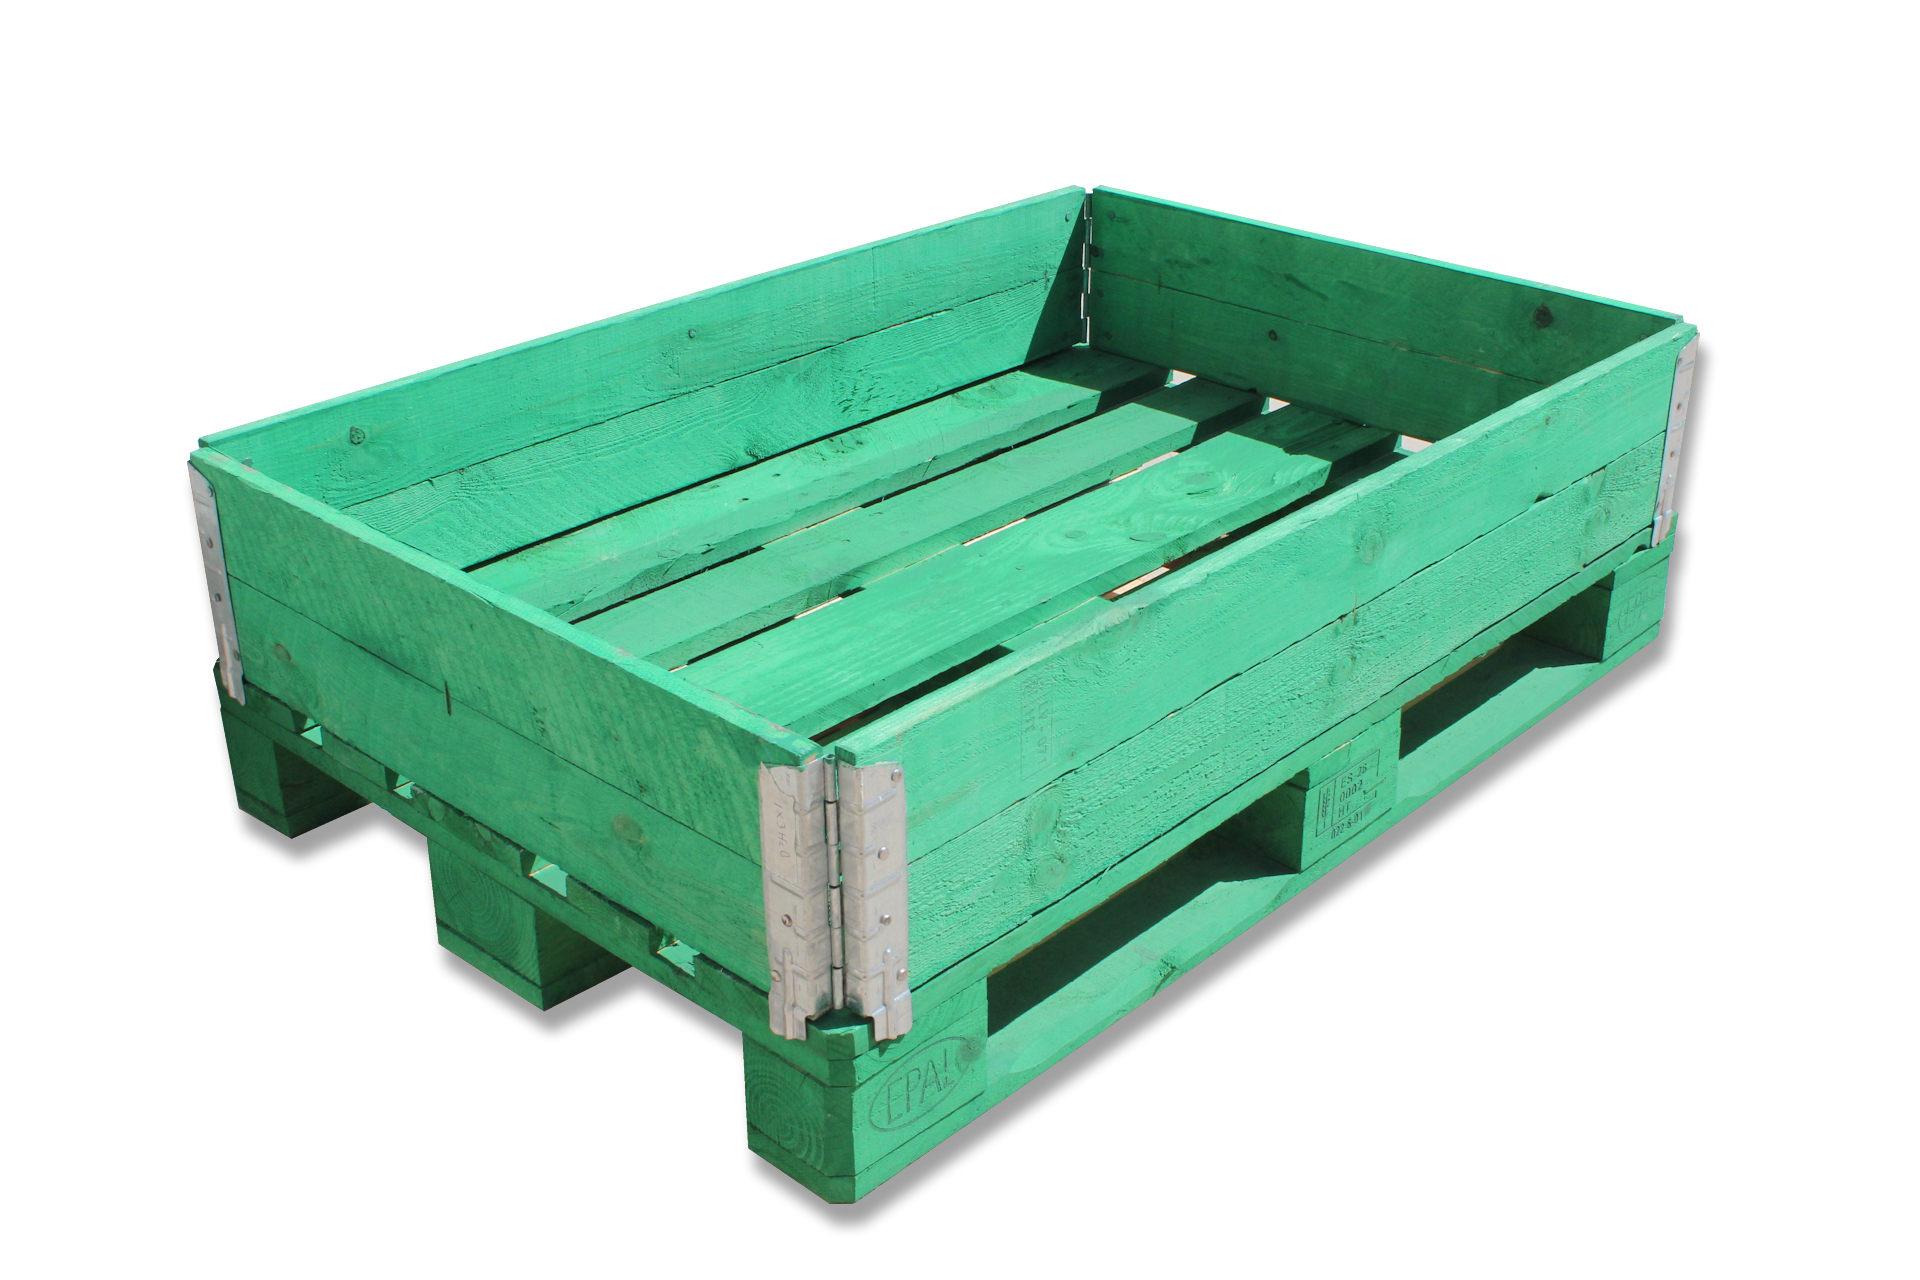 cerco verde para palet europalet 1200 x 800 palets y